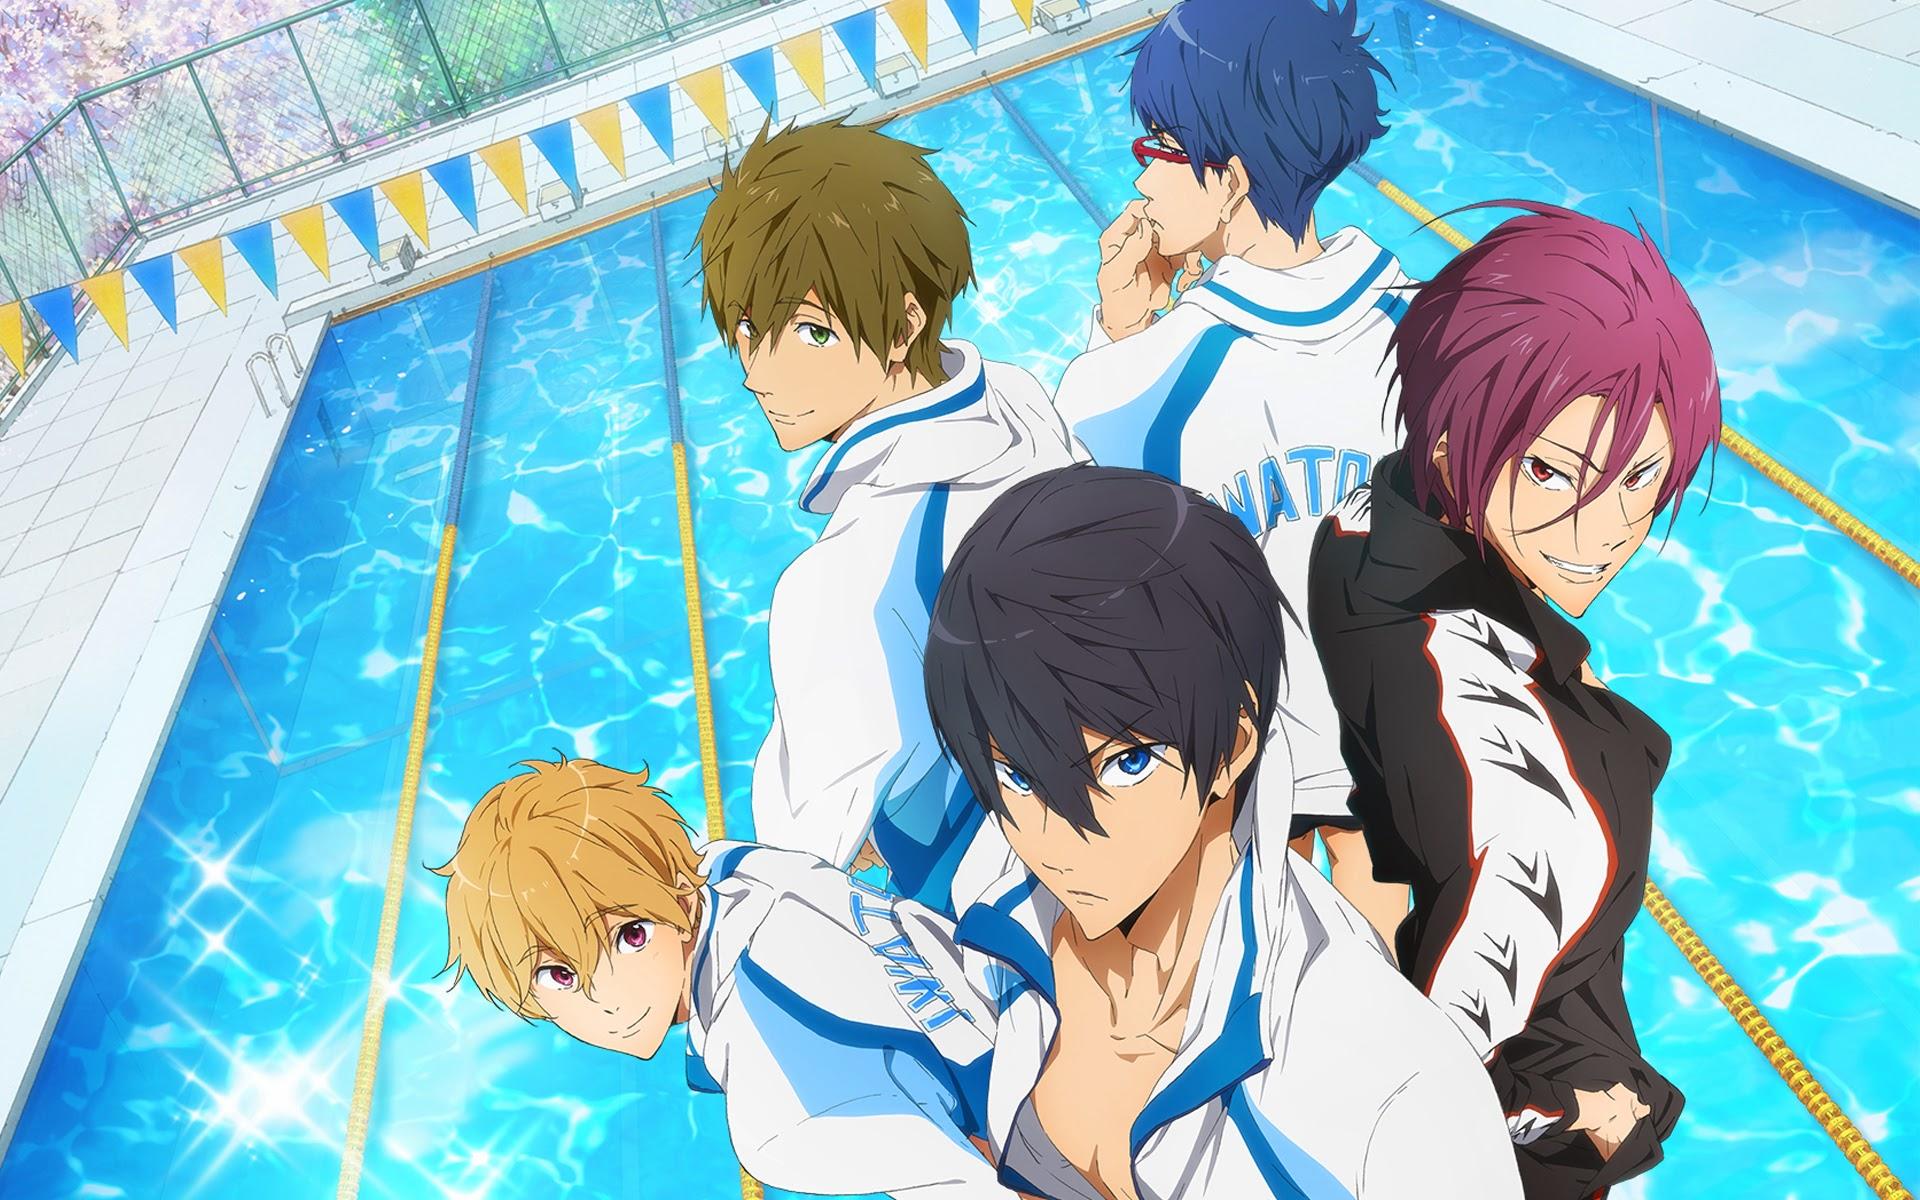 Free!.Iwatobi.Swim.Club.Anime.haruka.rin.nagisa.makoto.rei.boys.wallpaper404.com.hd.1920x1200.jpg